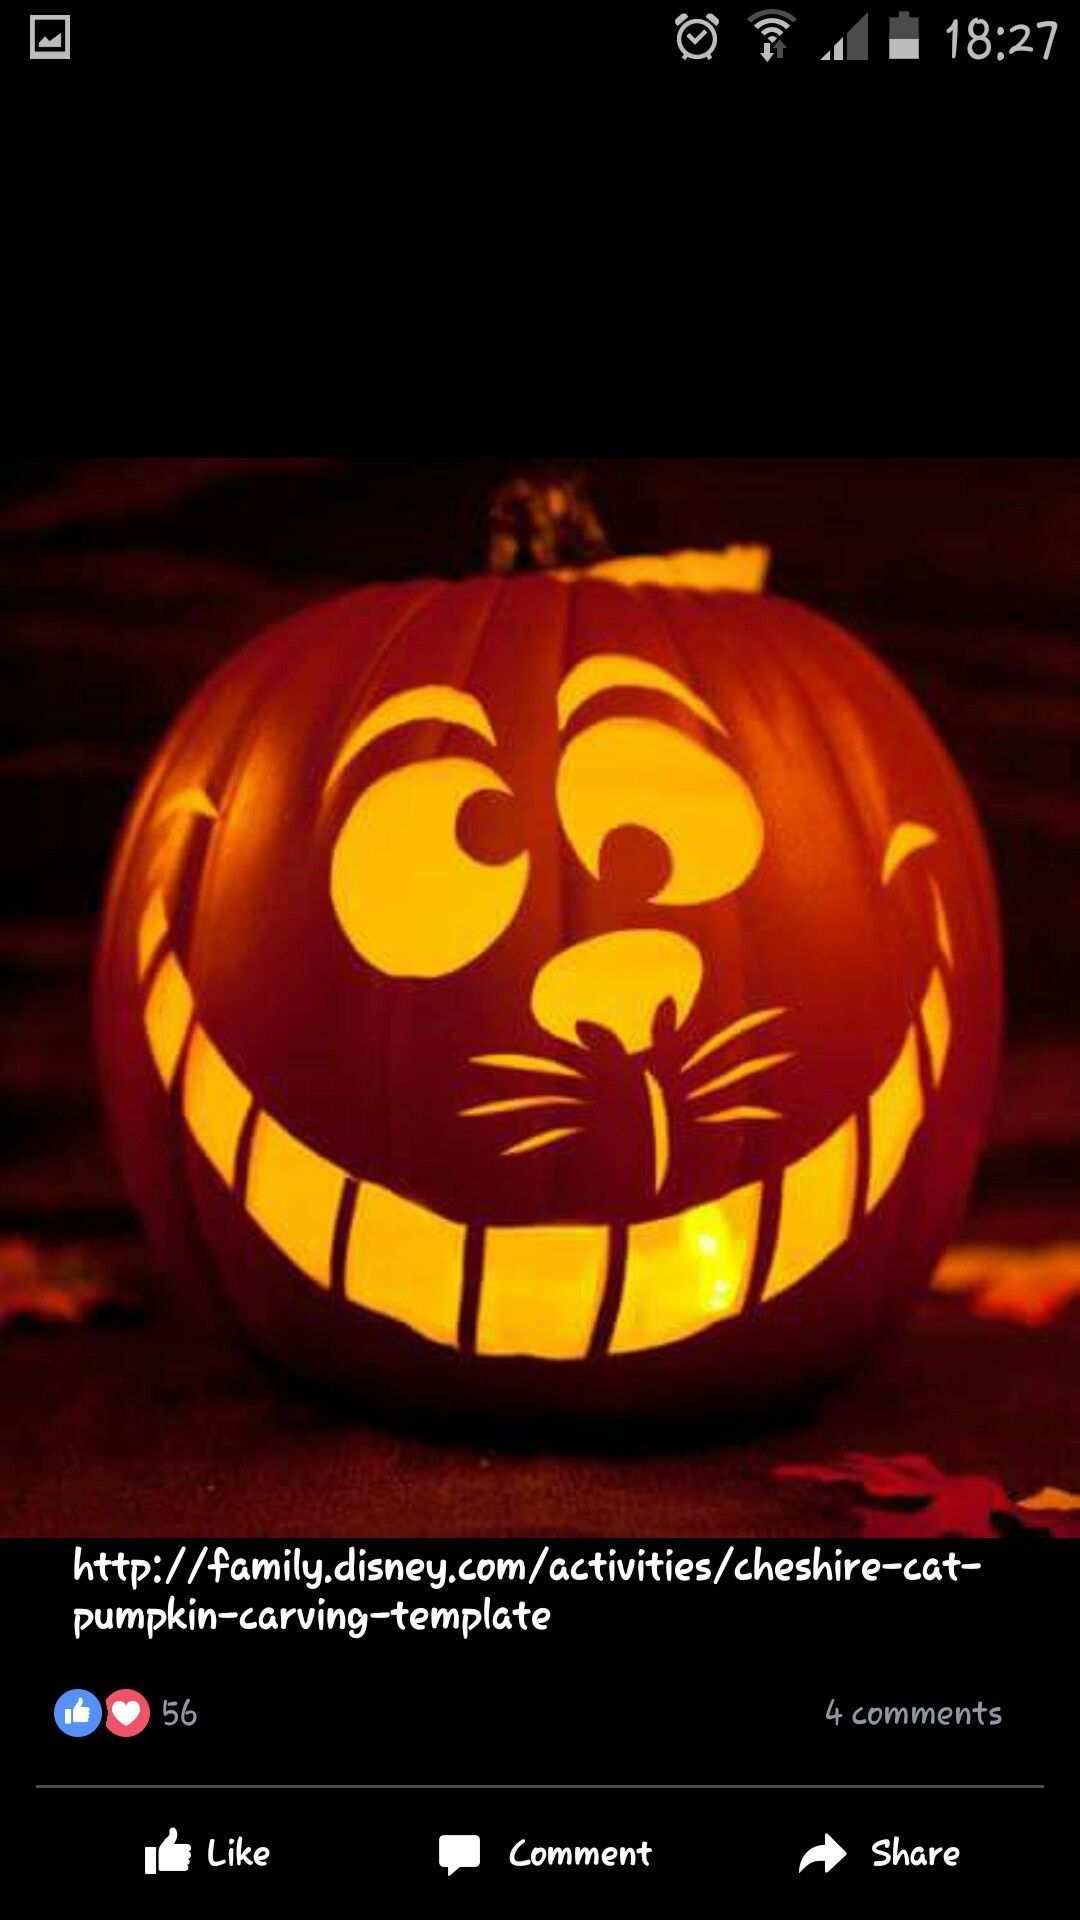 Cheshire Cat Pumpkin Kurbis Schnitzen Lustig Halloween Kurbis Schnitzen Kurbisse Schnitzen